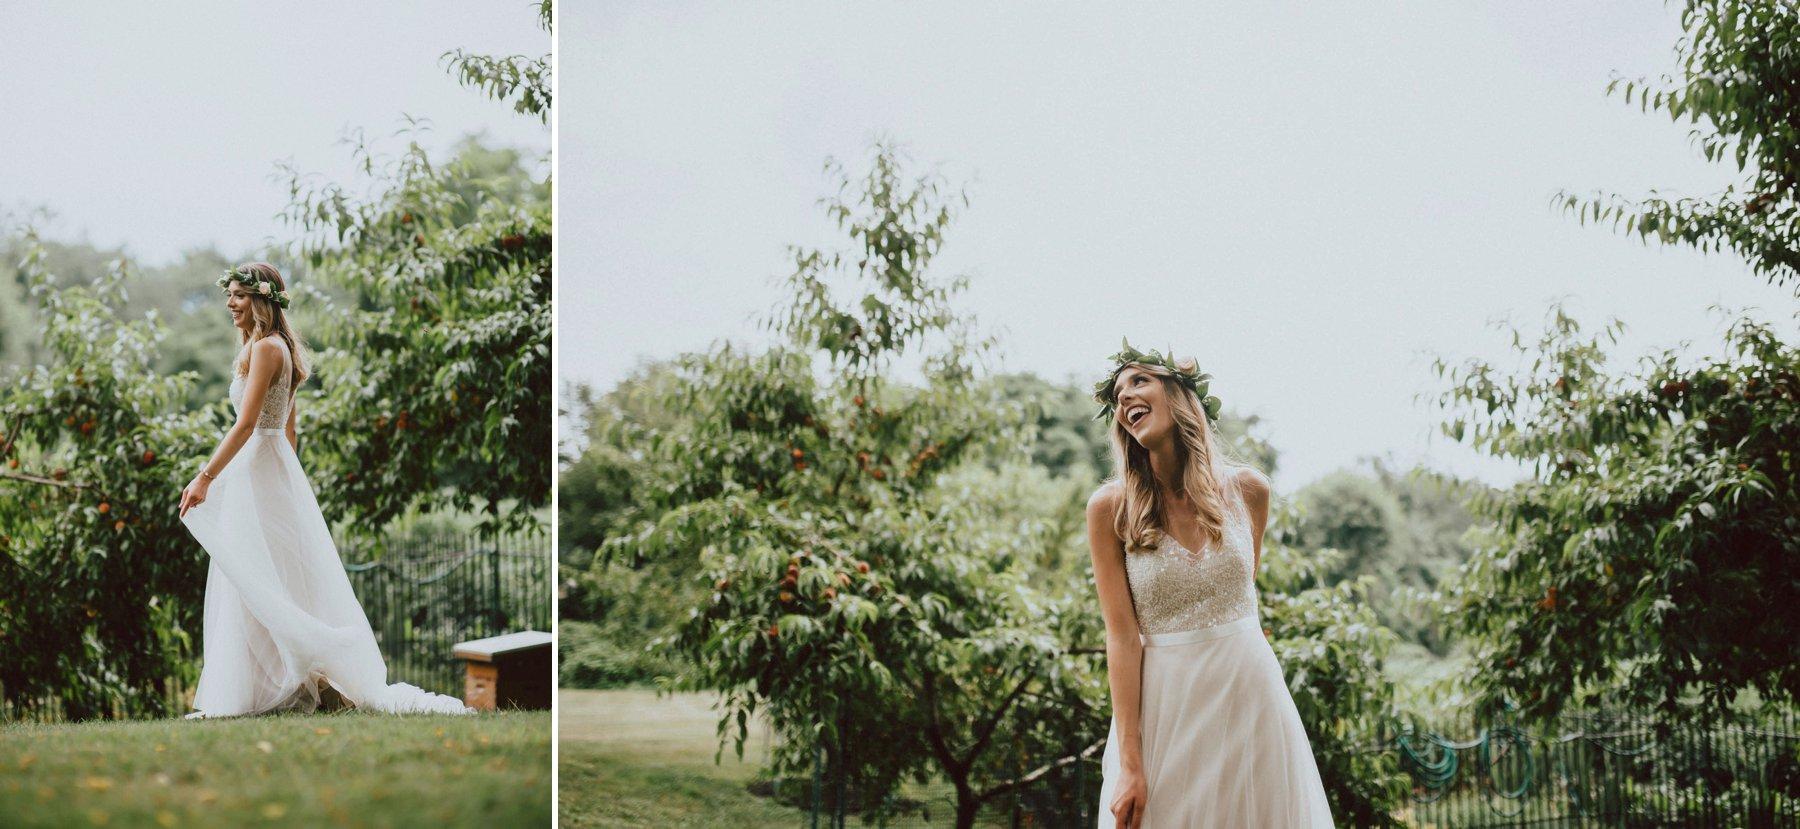 Knowlton-mansion-wedding-76.jpg